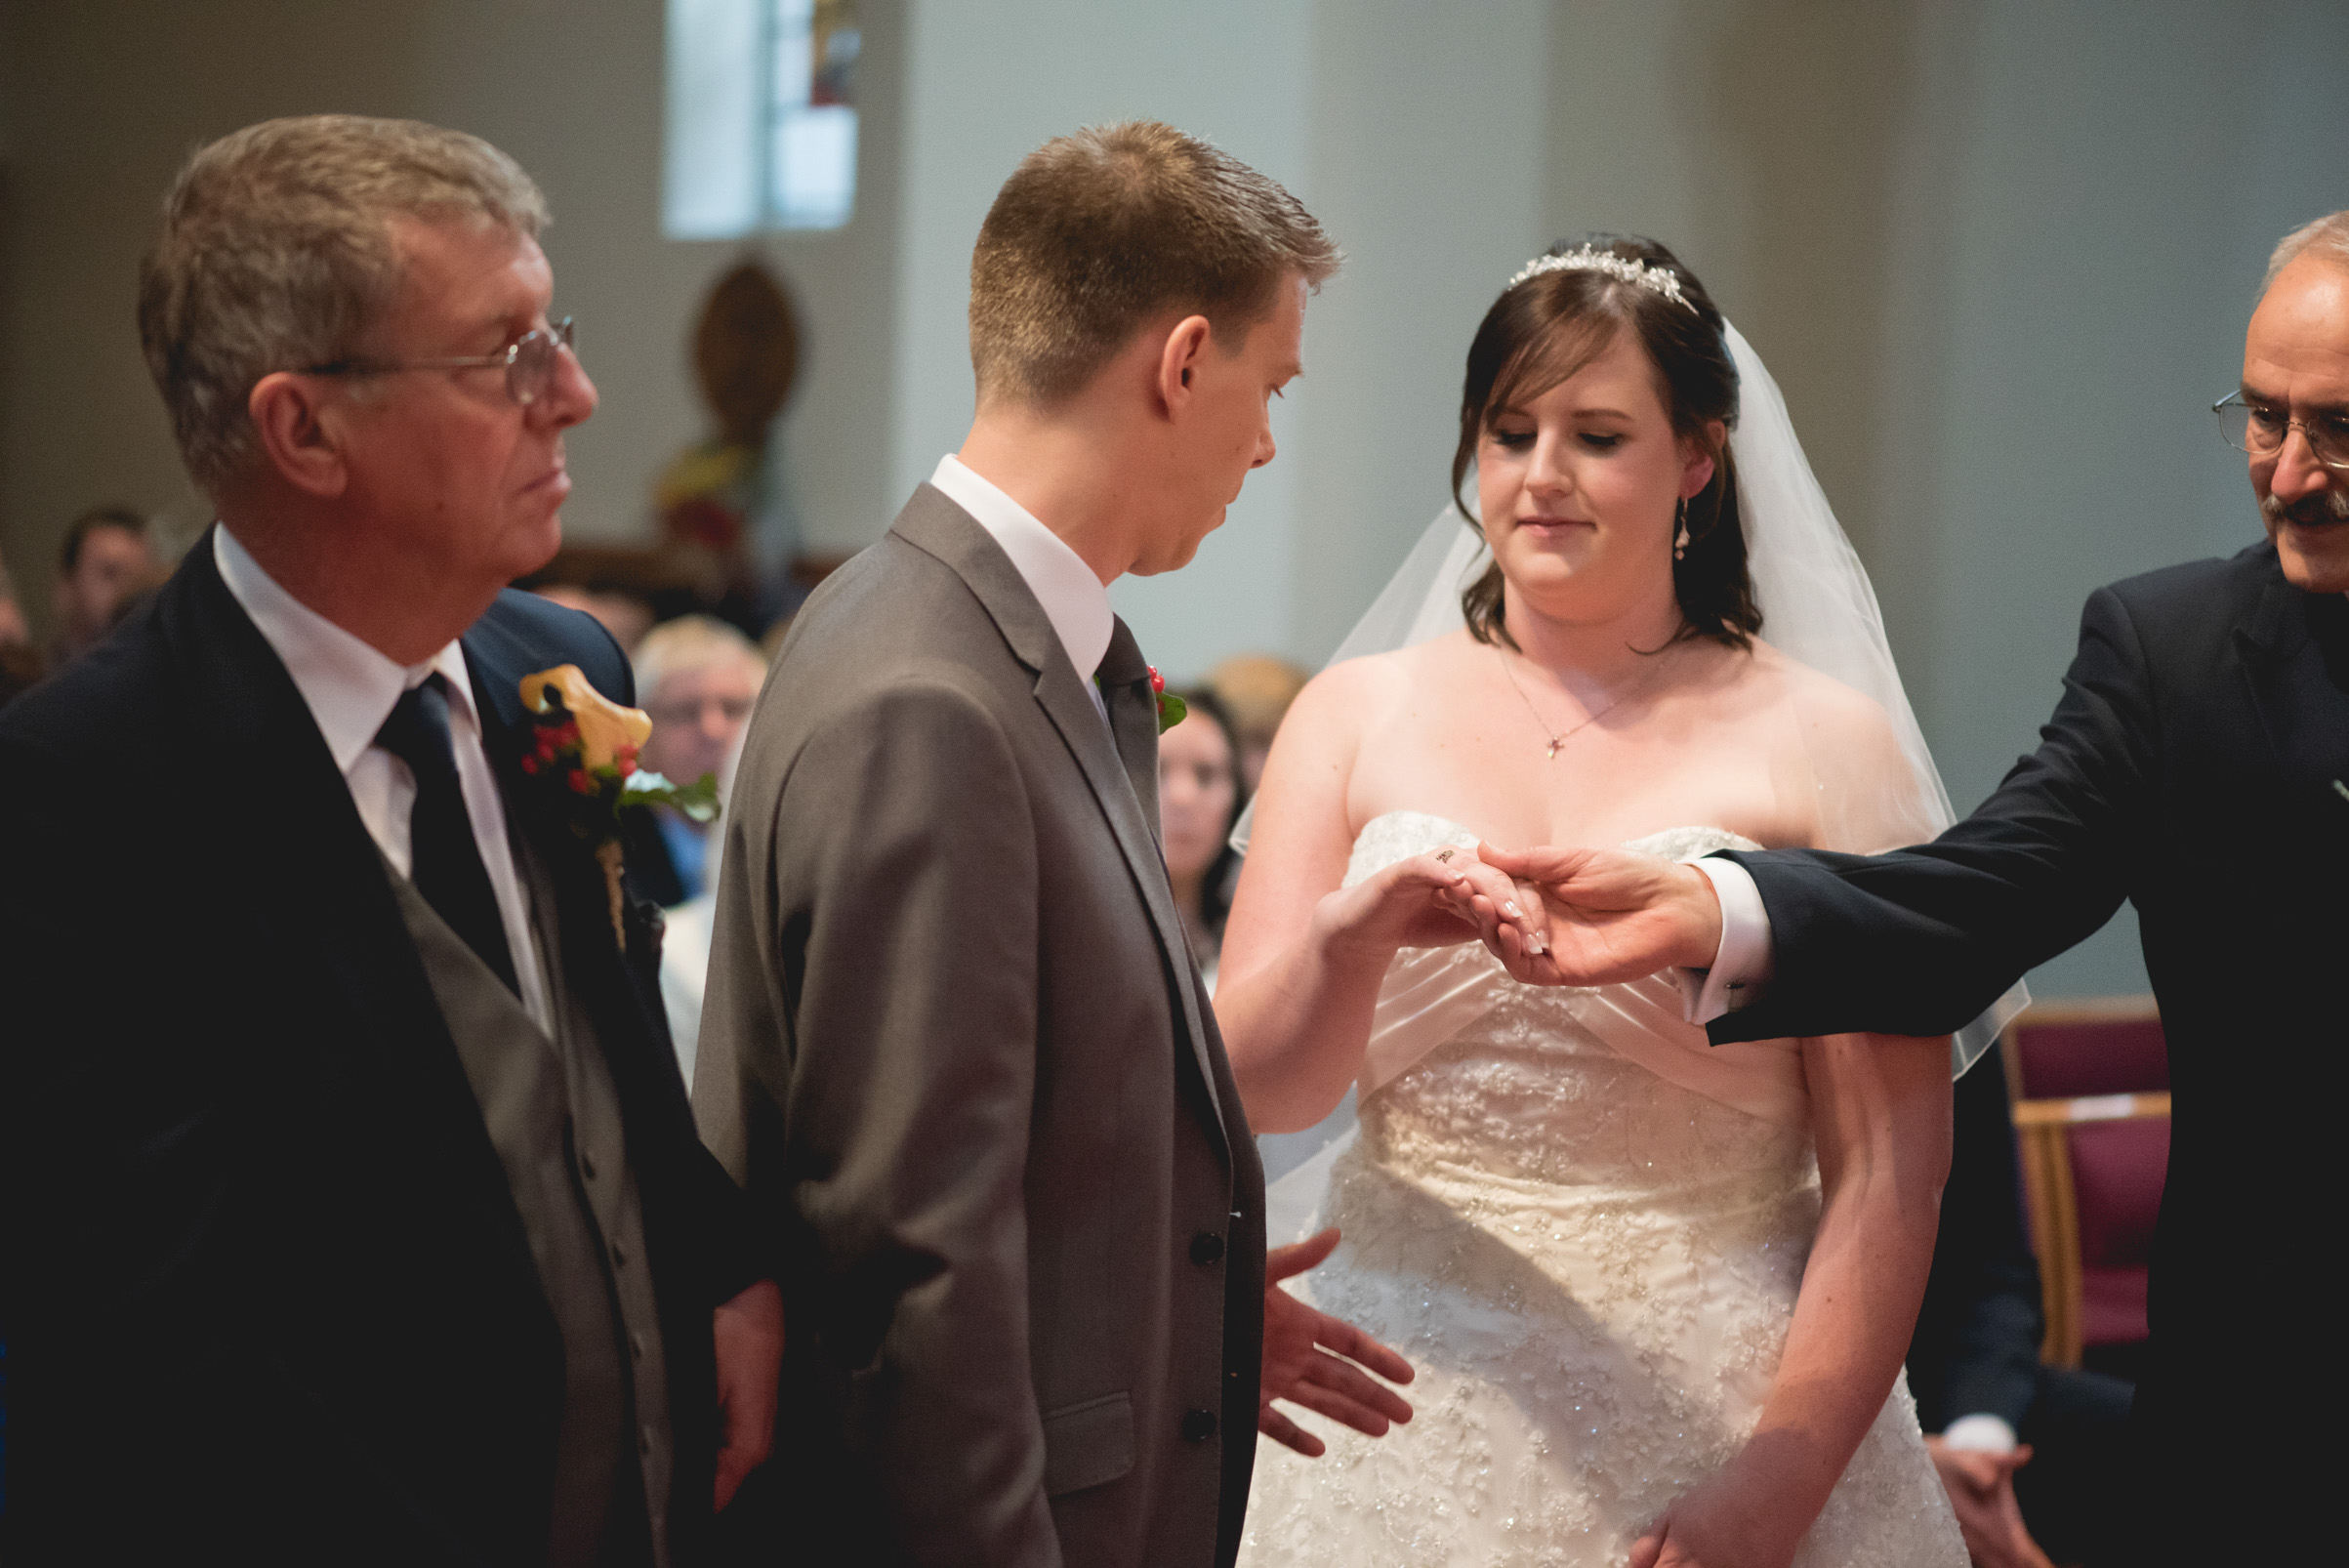 The+Fairlawns+wedding+Aldridge+StLukes+Church-89.jpg